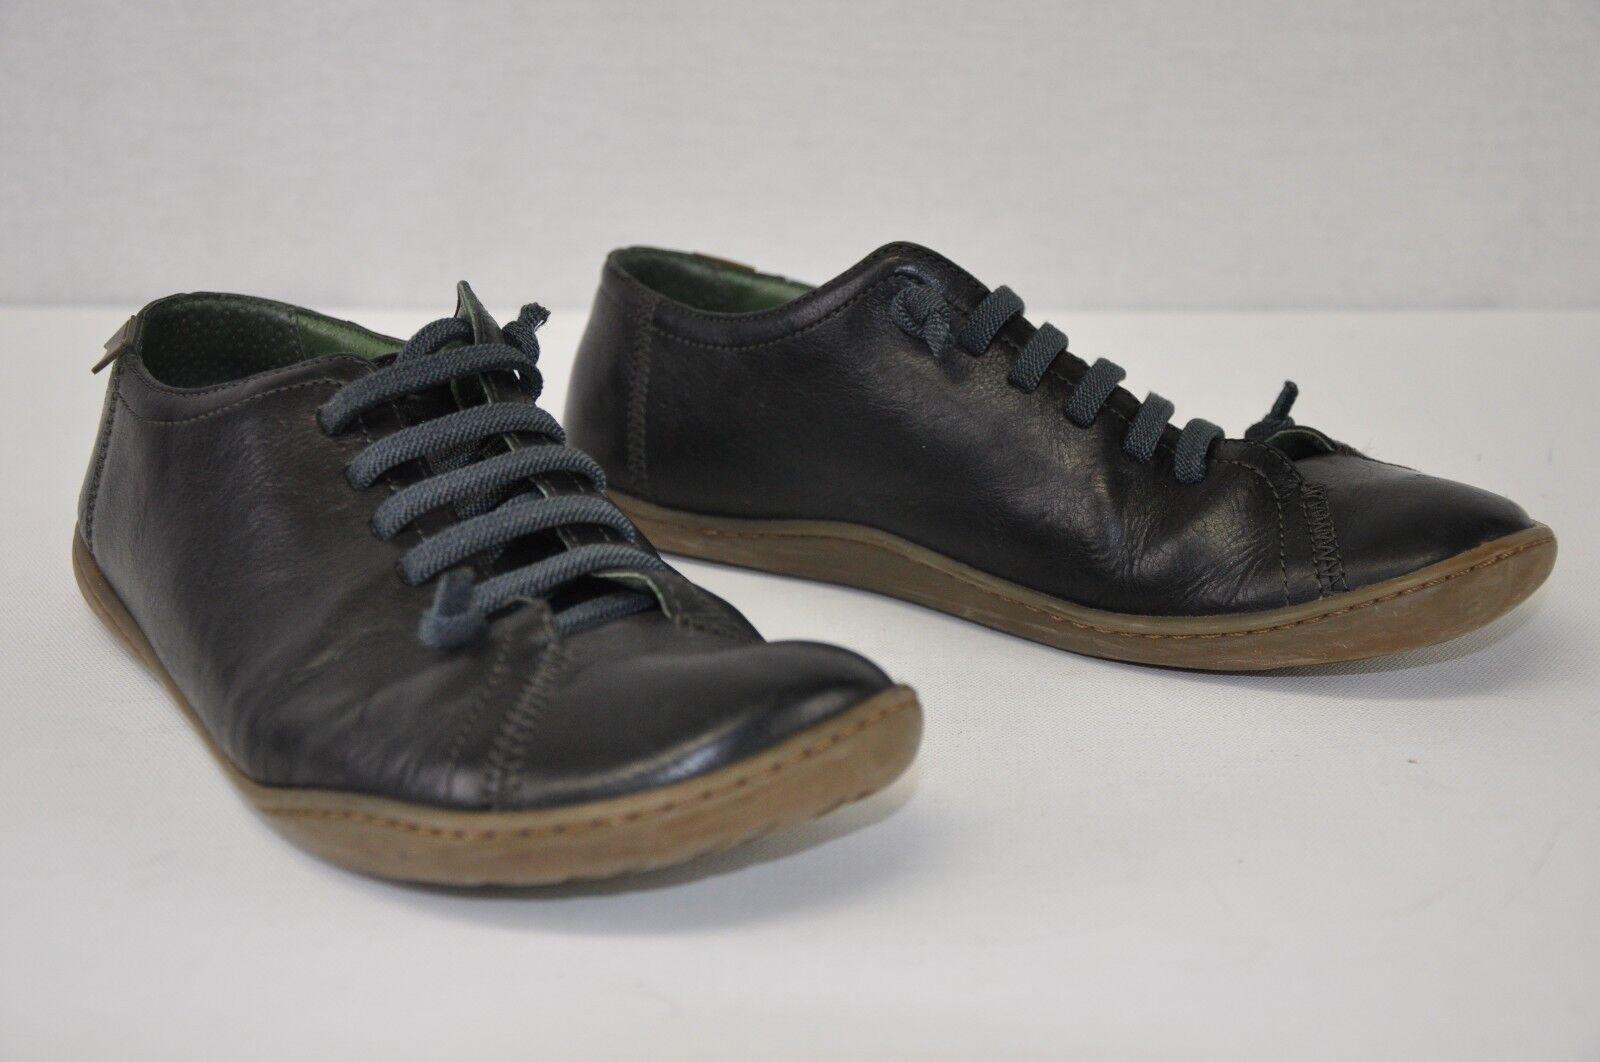 Remonte CAMPER nero Slip On Laces Stitch Detail scarpe da ginnastica EUR 40 US 9-9.5